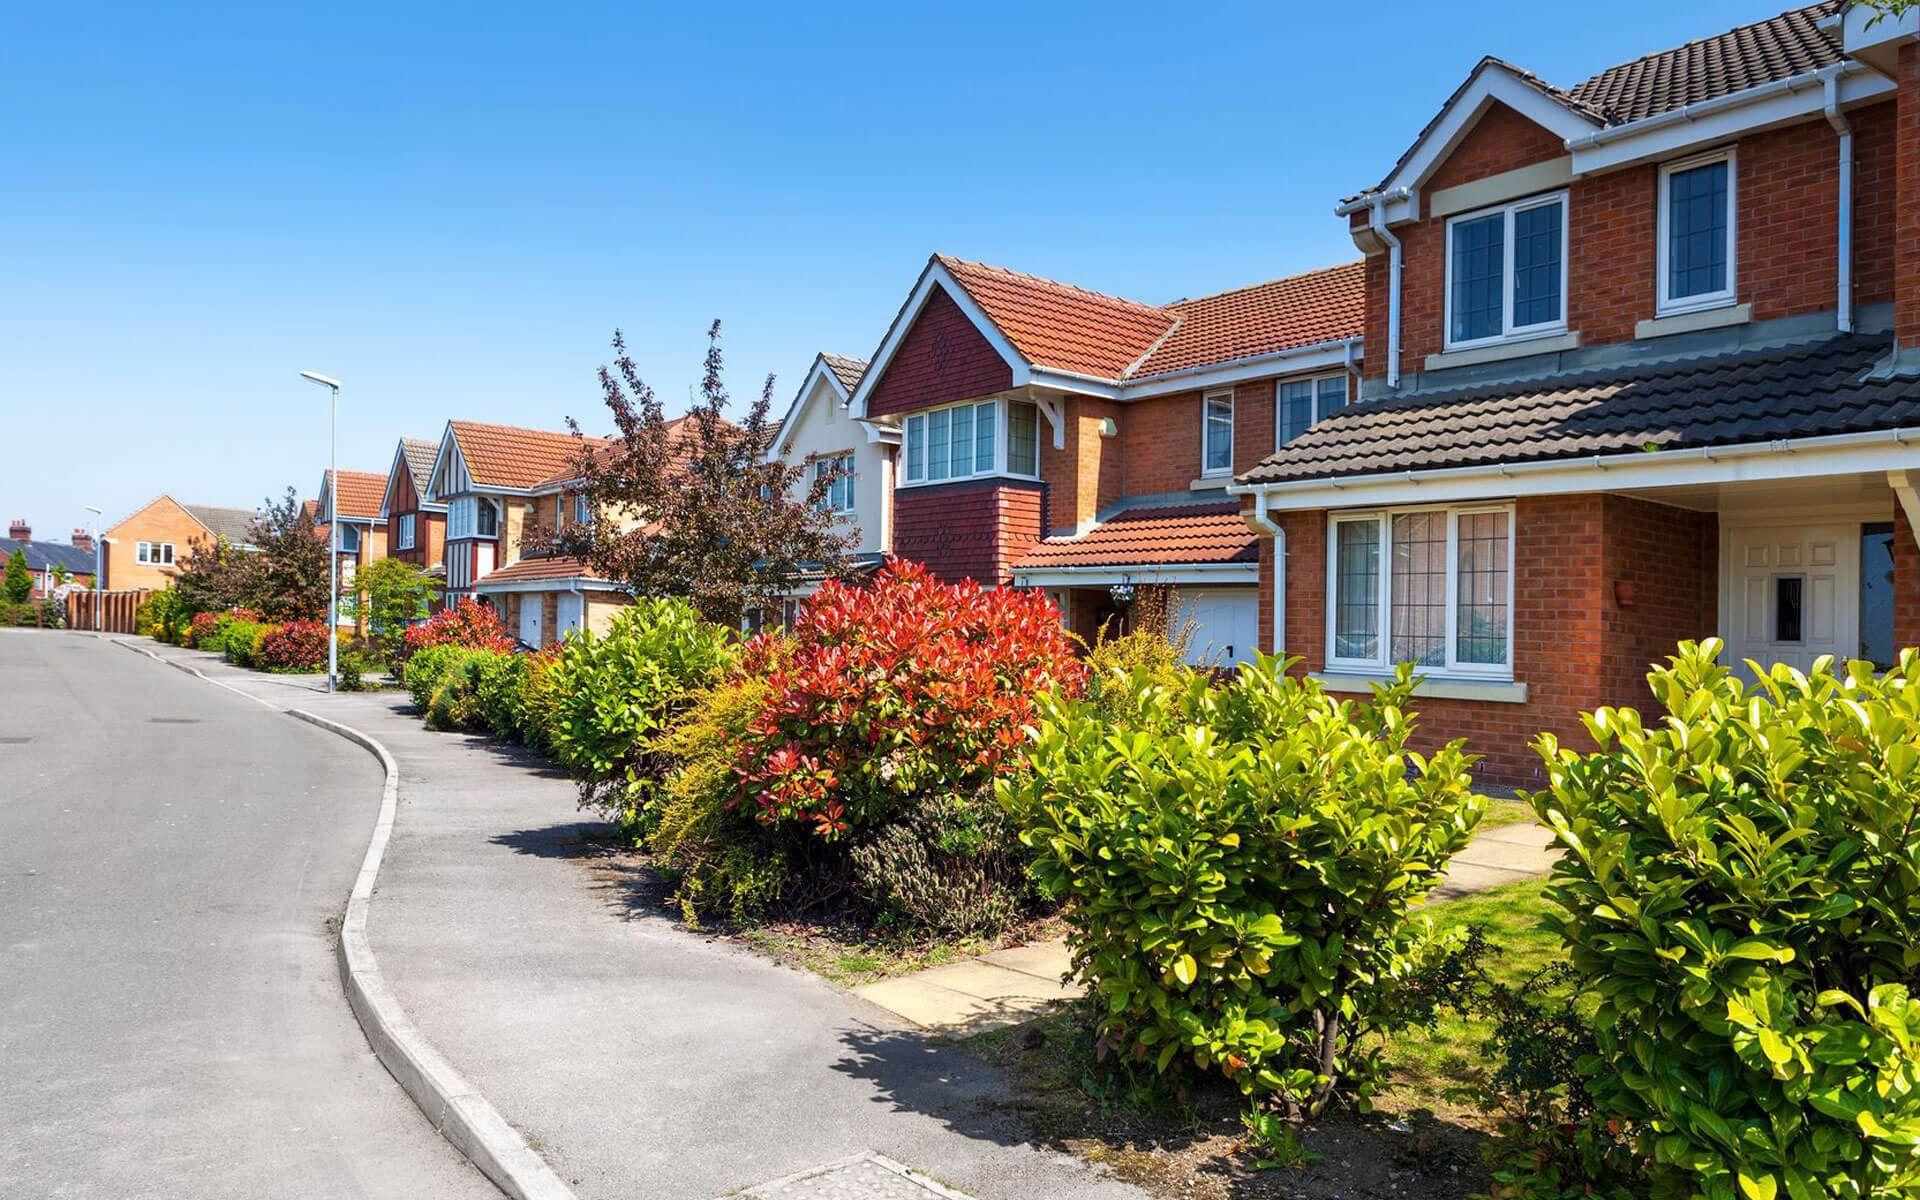 RE/MAX Property Estate Agents, Livingston, Scotland